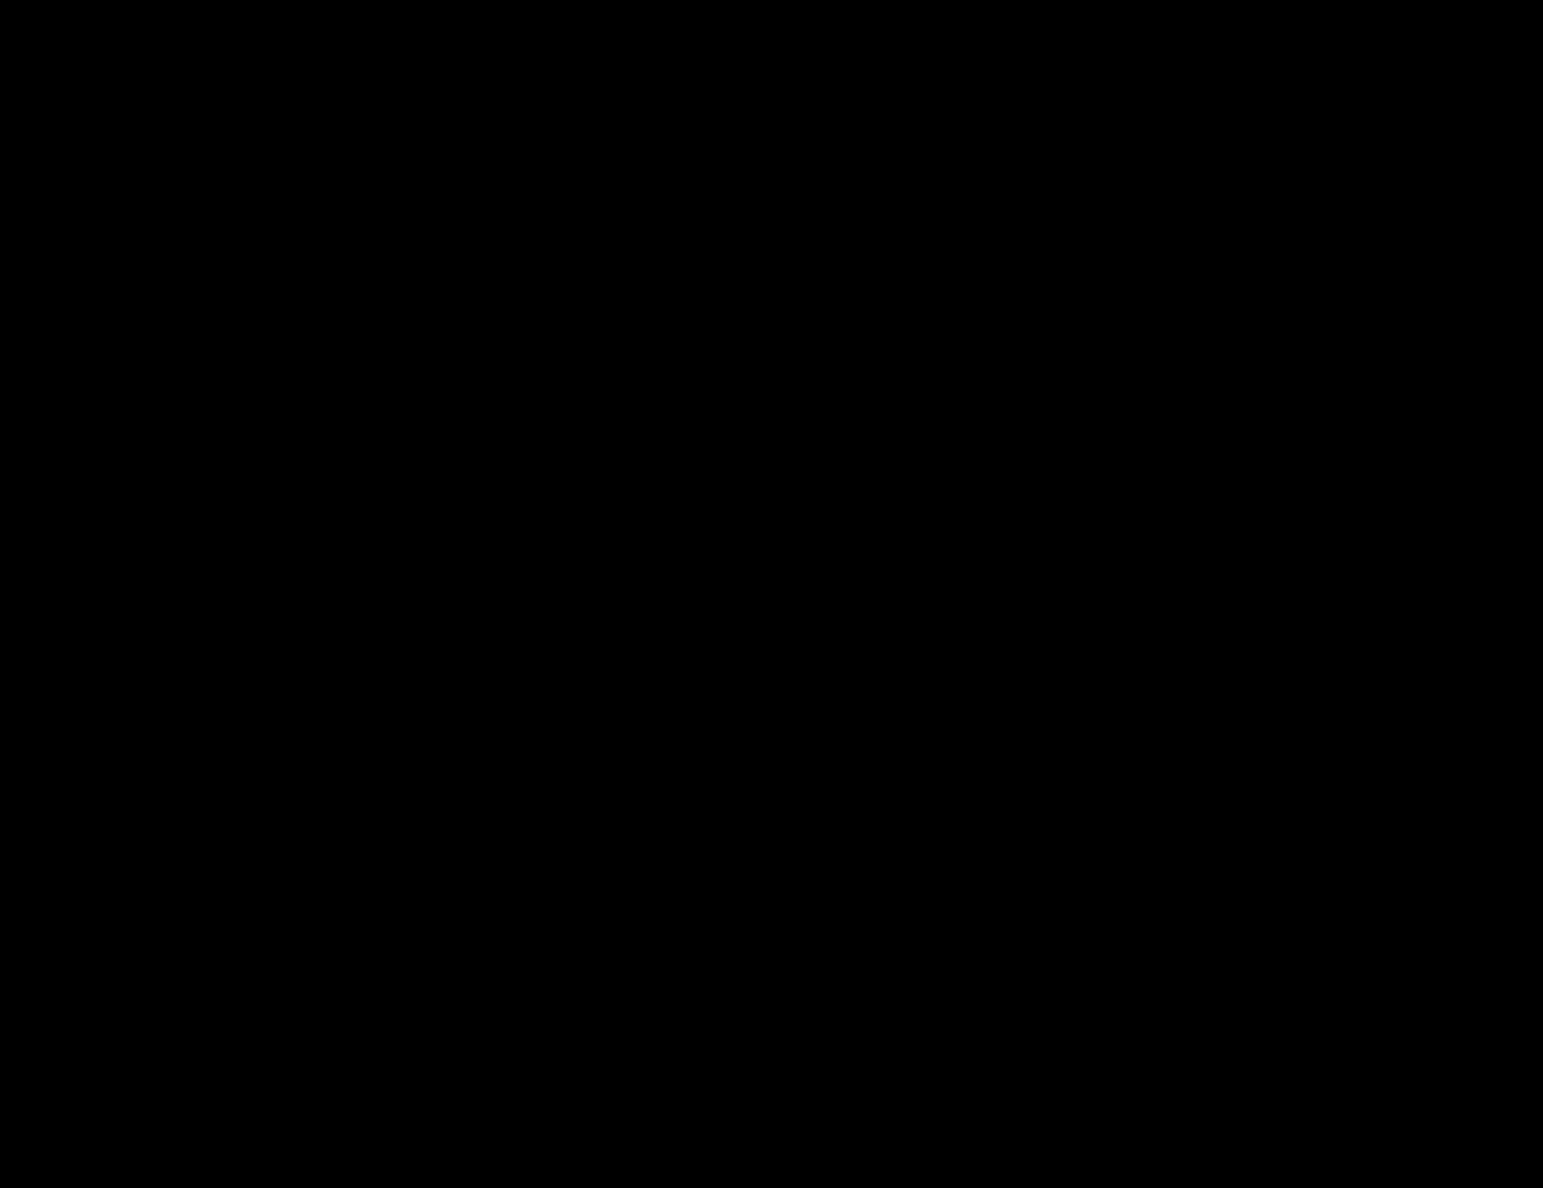 portfolio-setup-v1_hwrg